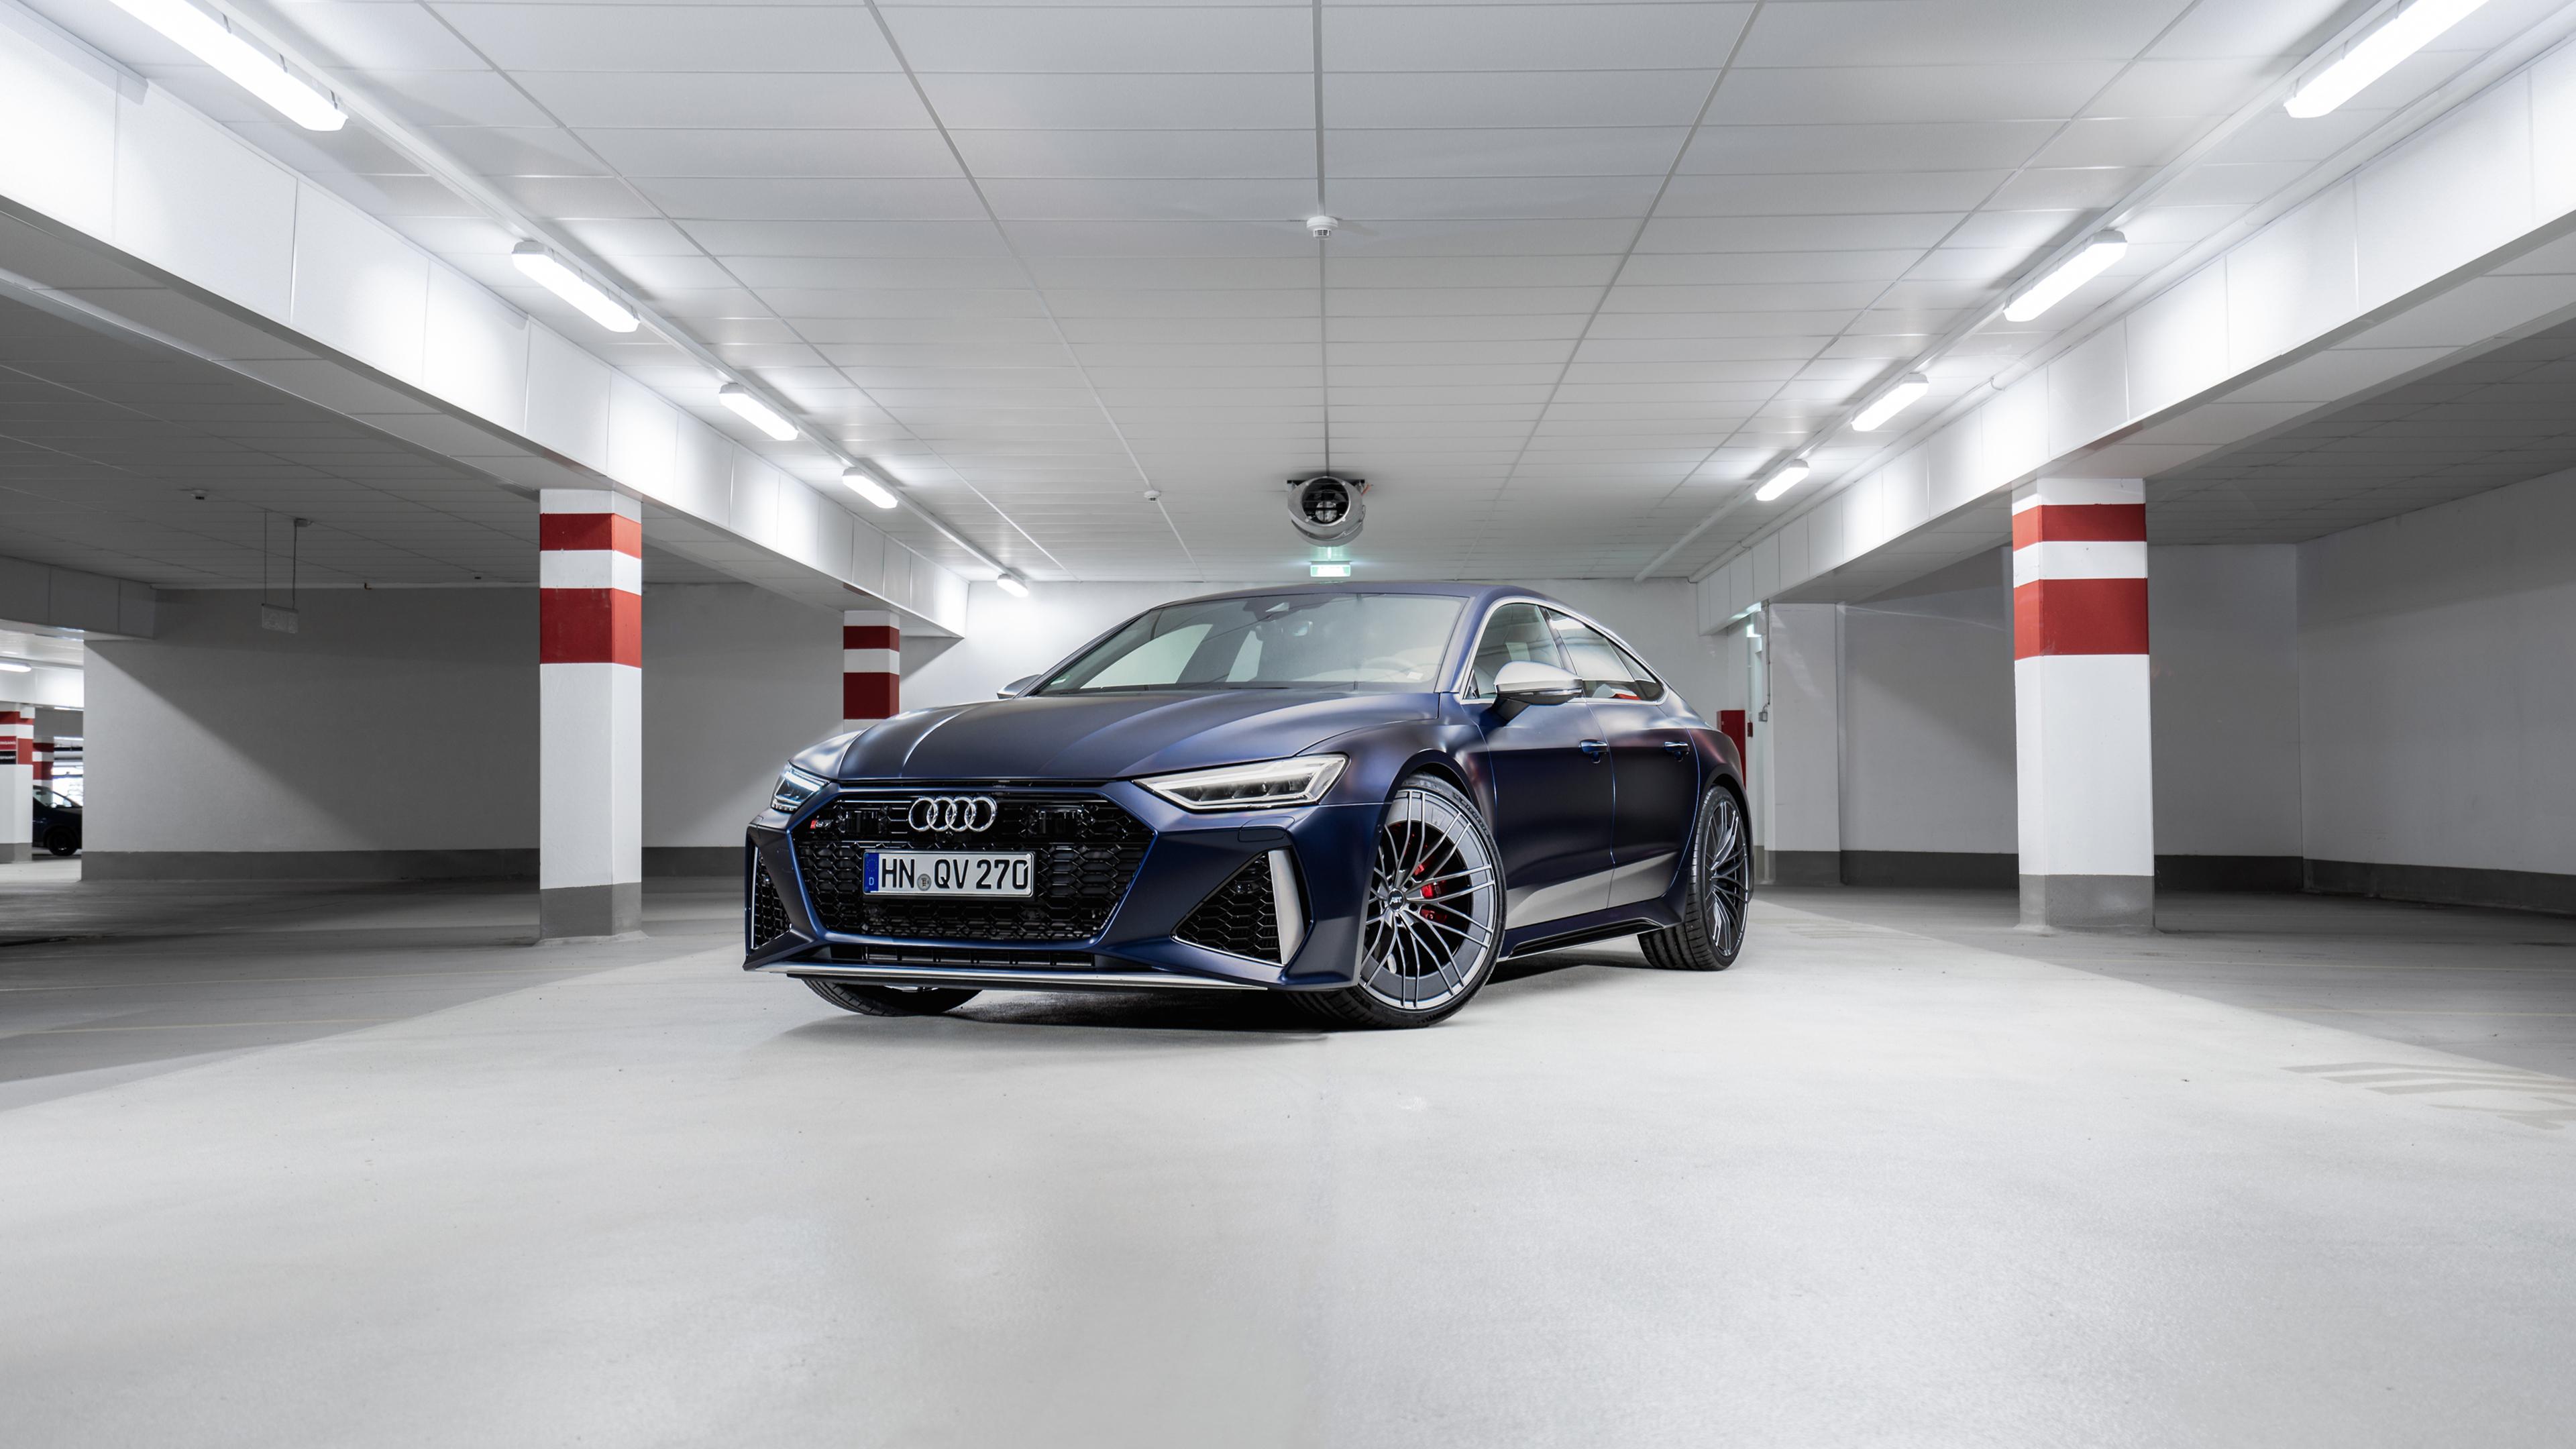 Abt Audi Rs 7 Sportback 2020 4k Wallpaper Hd Car Wallpapers Id 14171